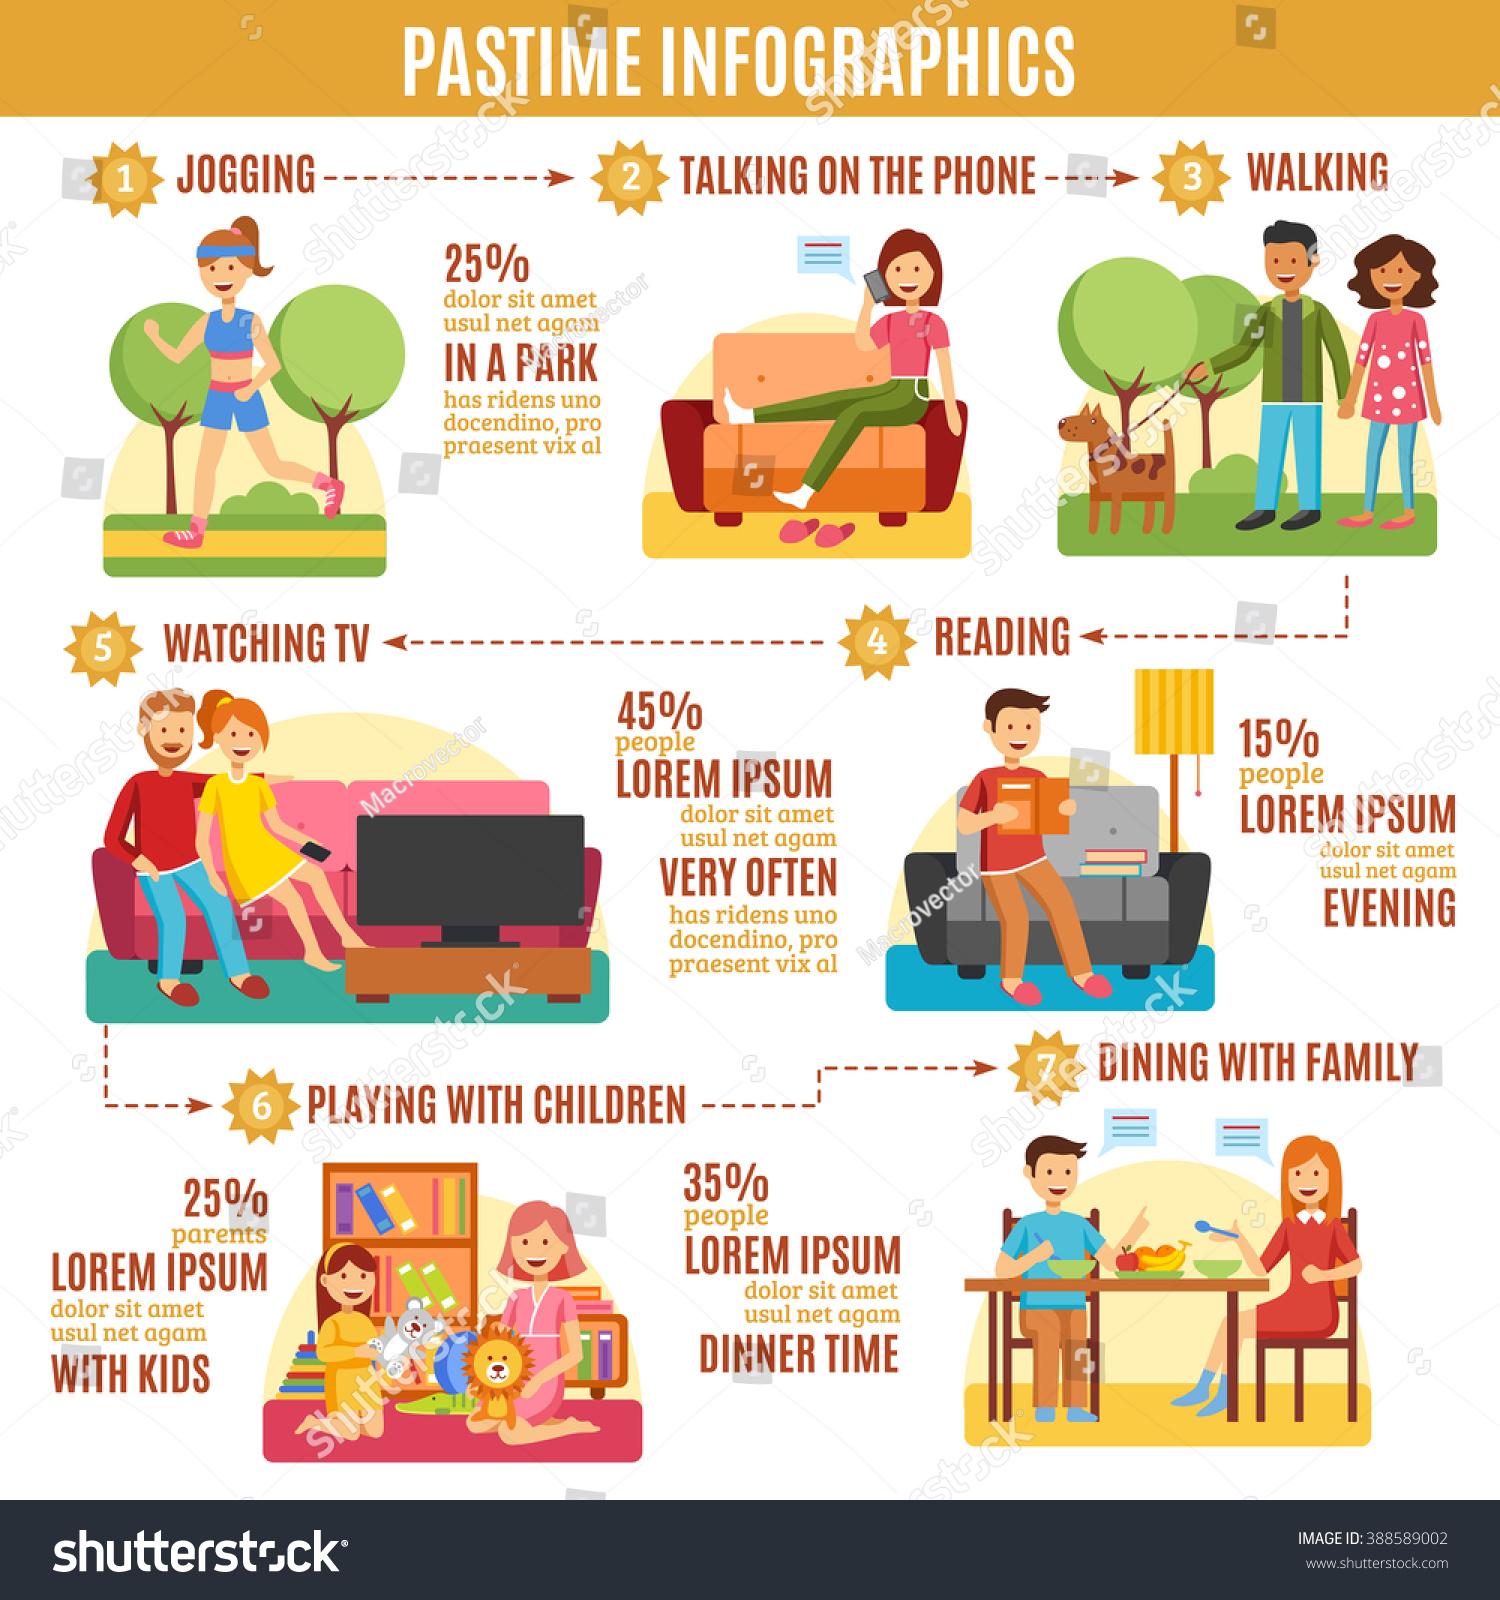 6 Basic Business Activities